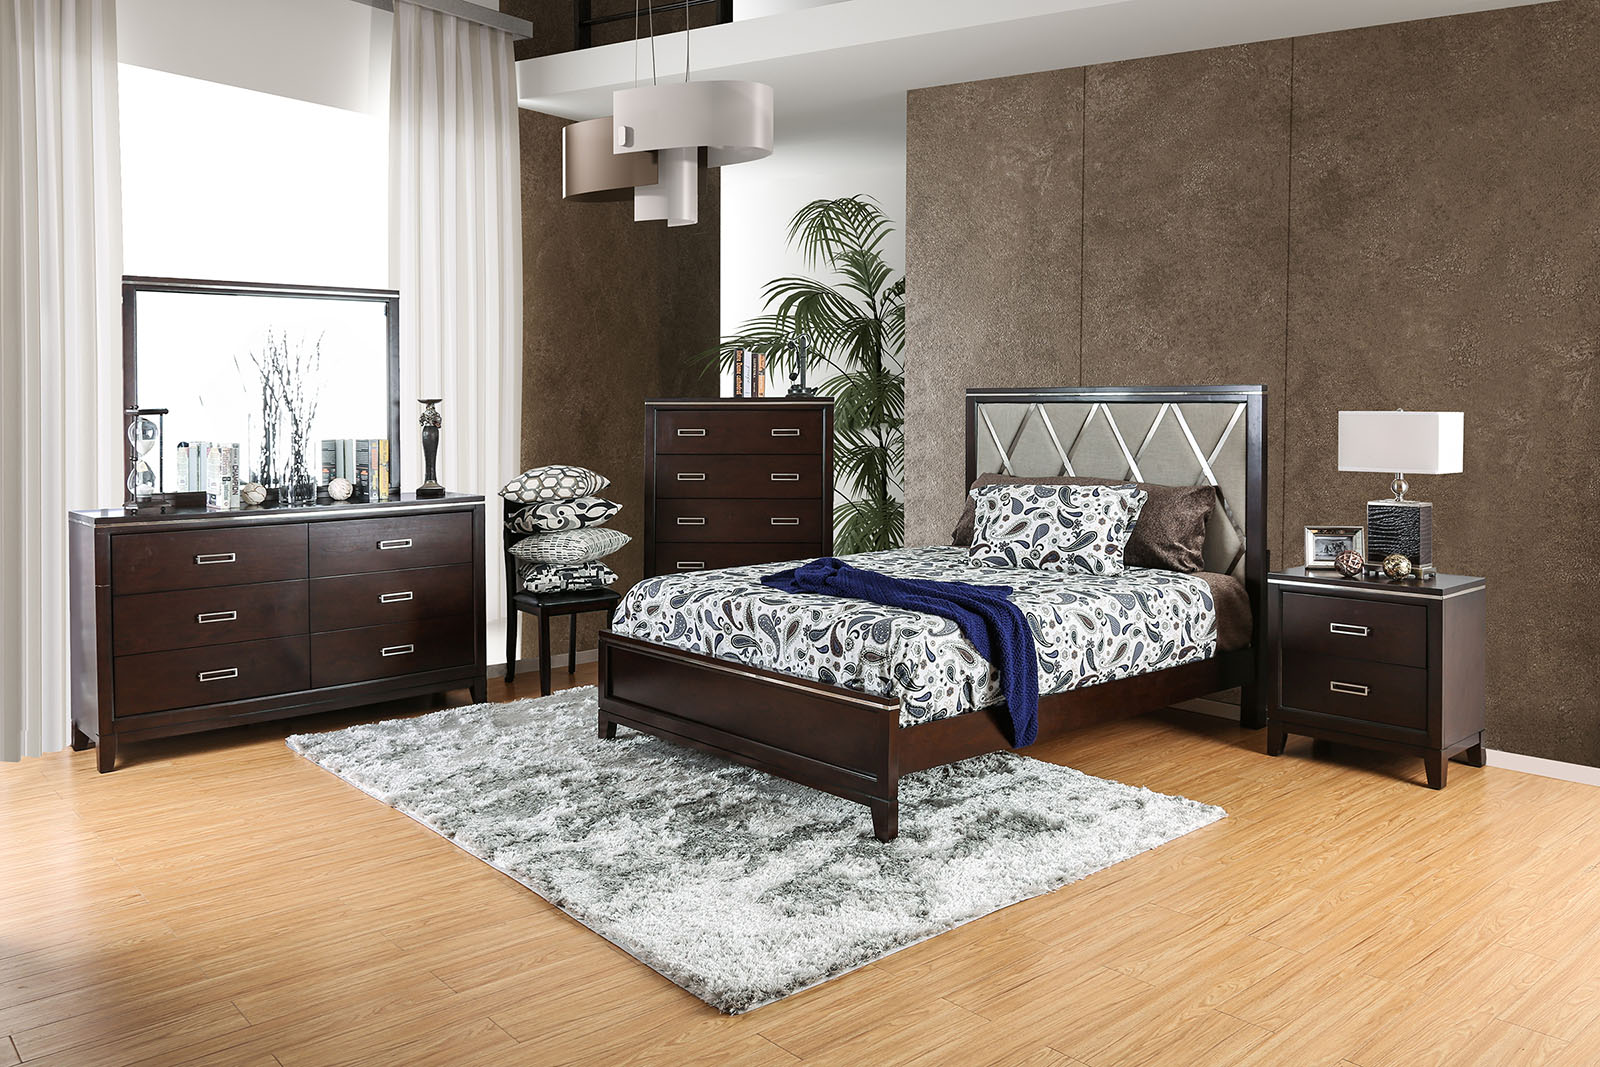 Bedroom Queen Bed Cherry Finish 4pc Set Foa Hot Sectionals